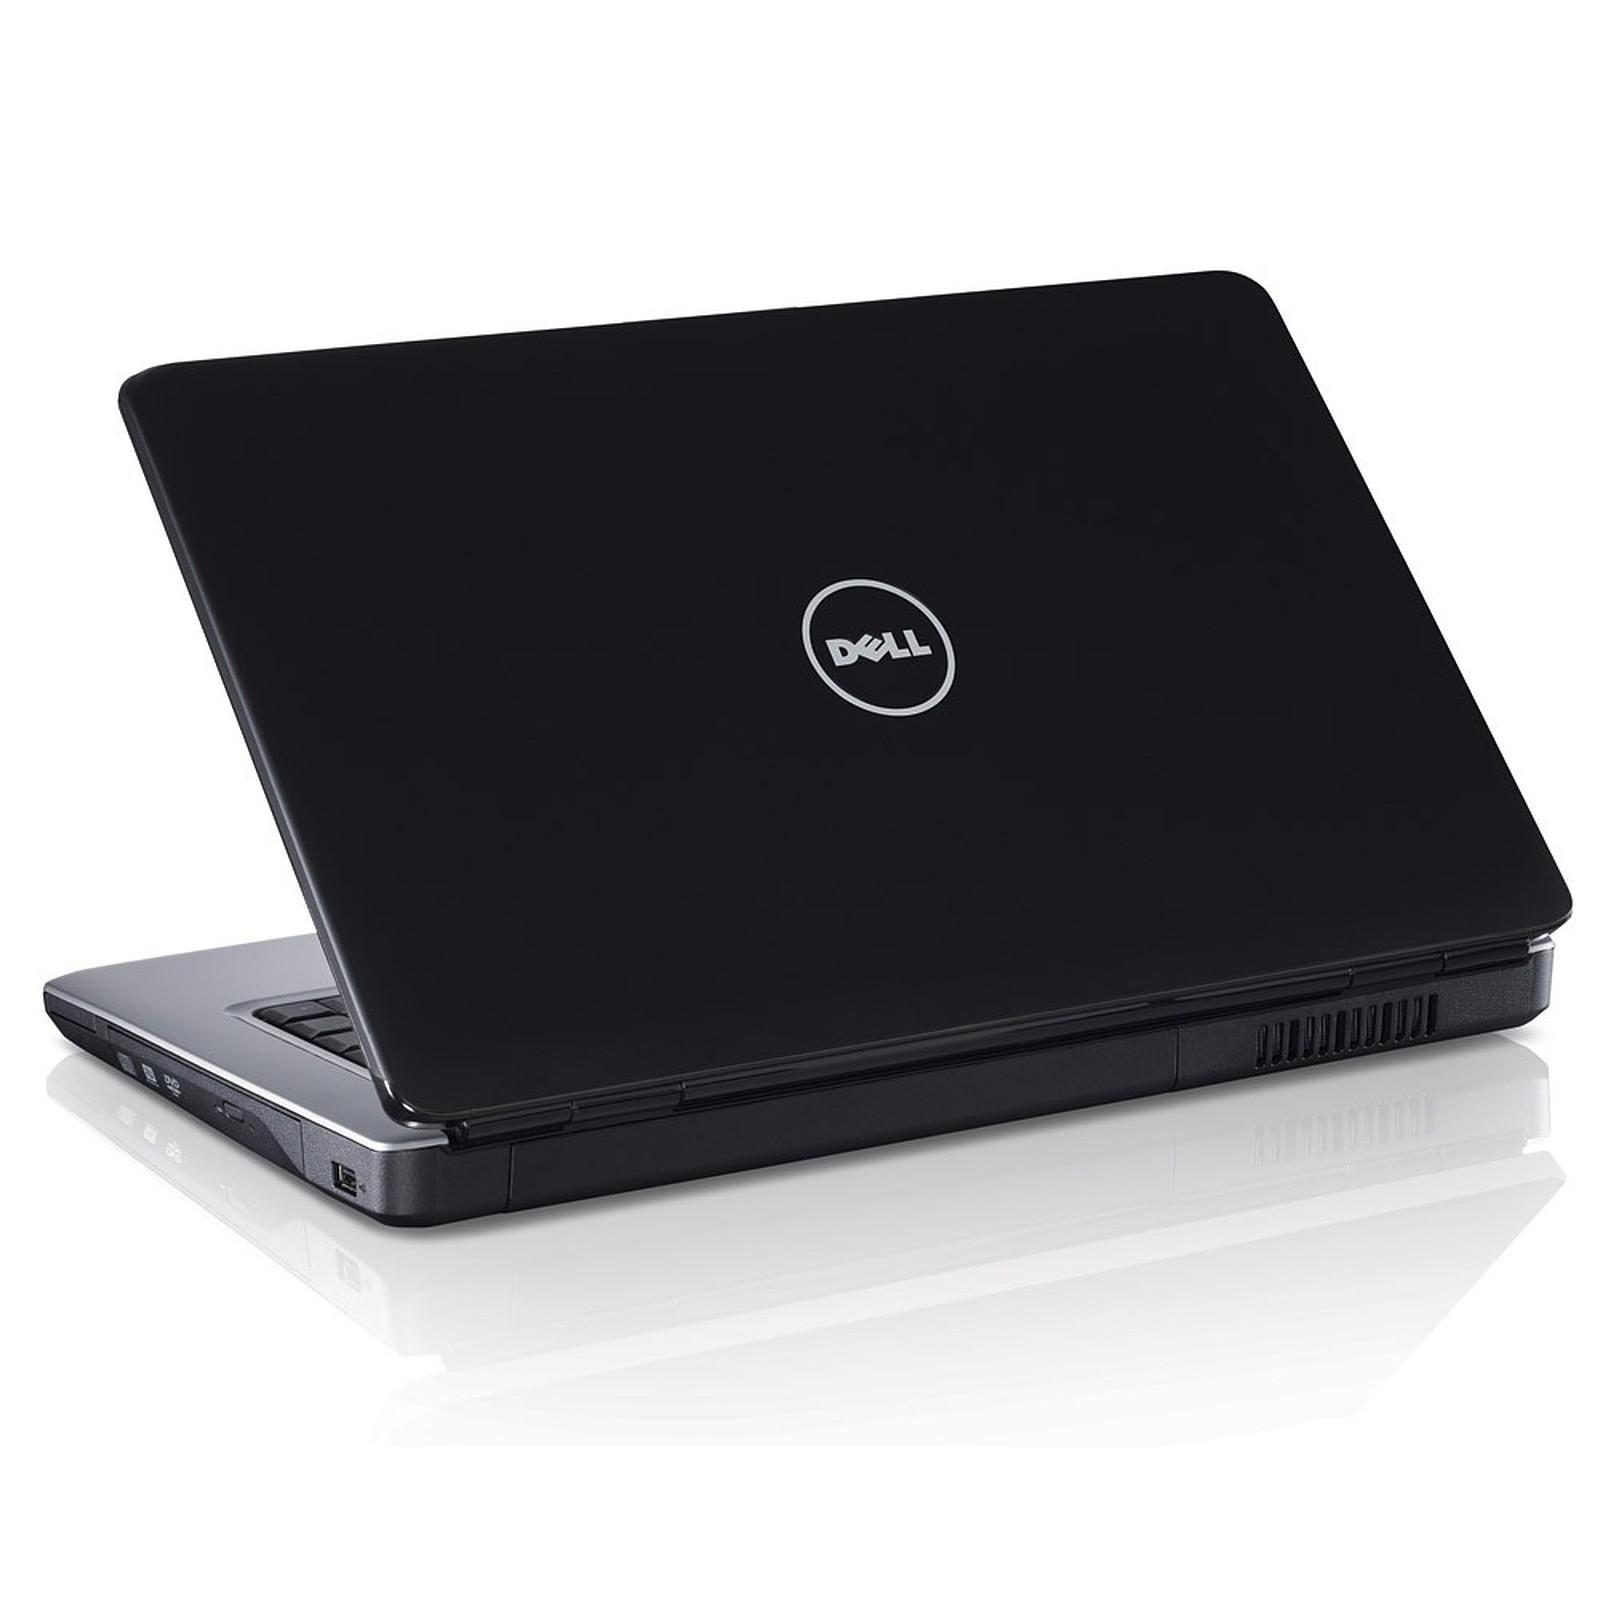 Dell Inspiron 1545 Noir